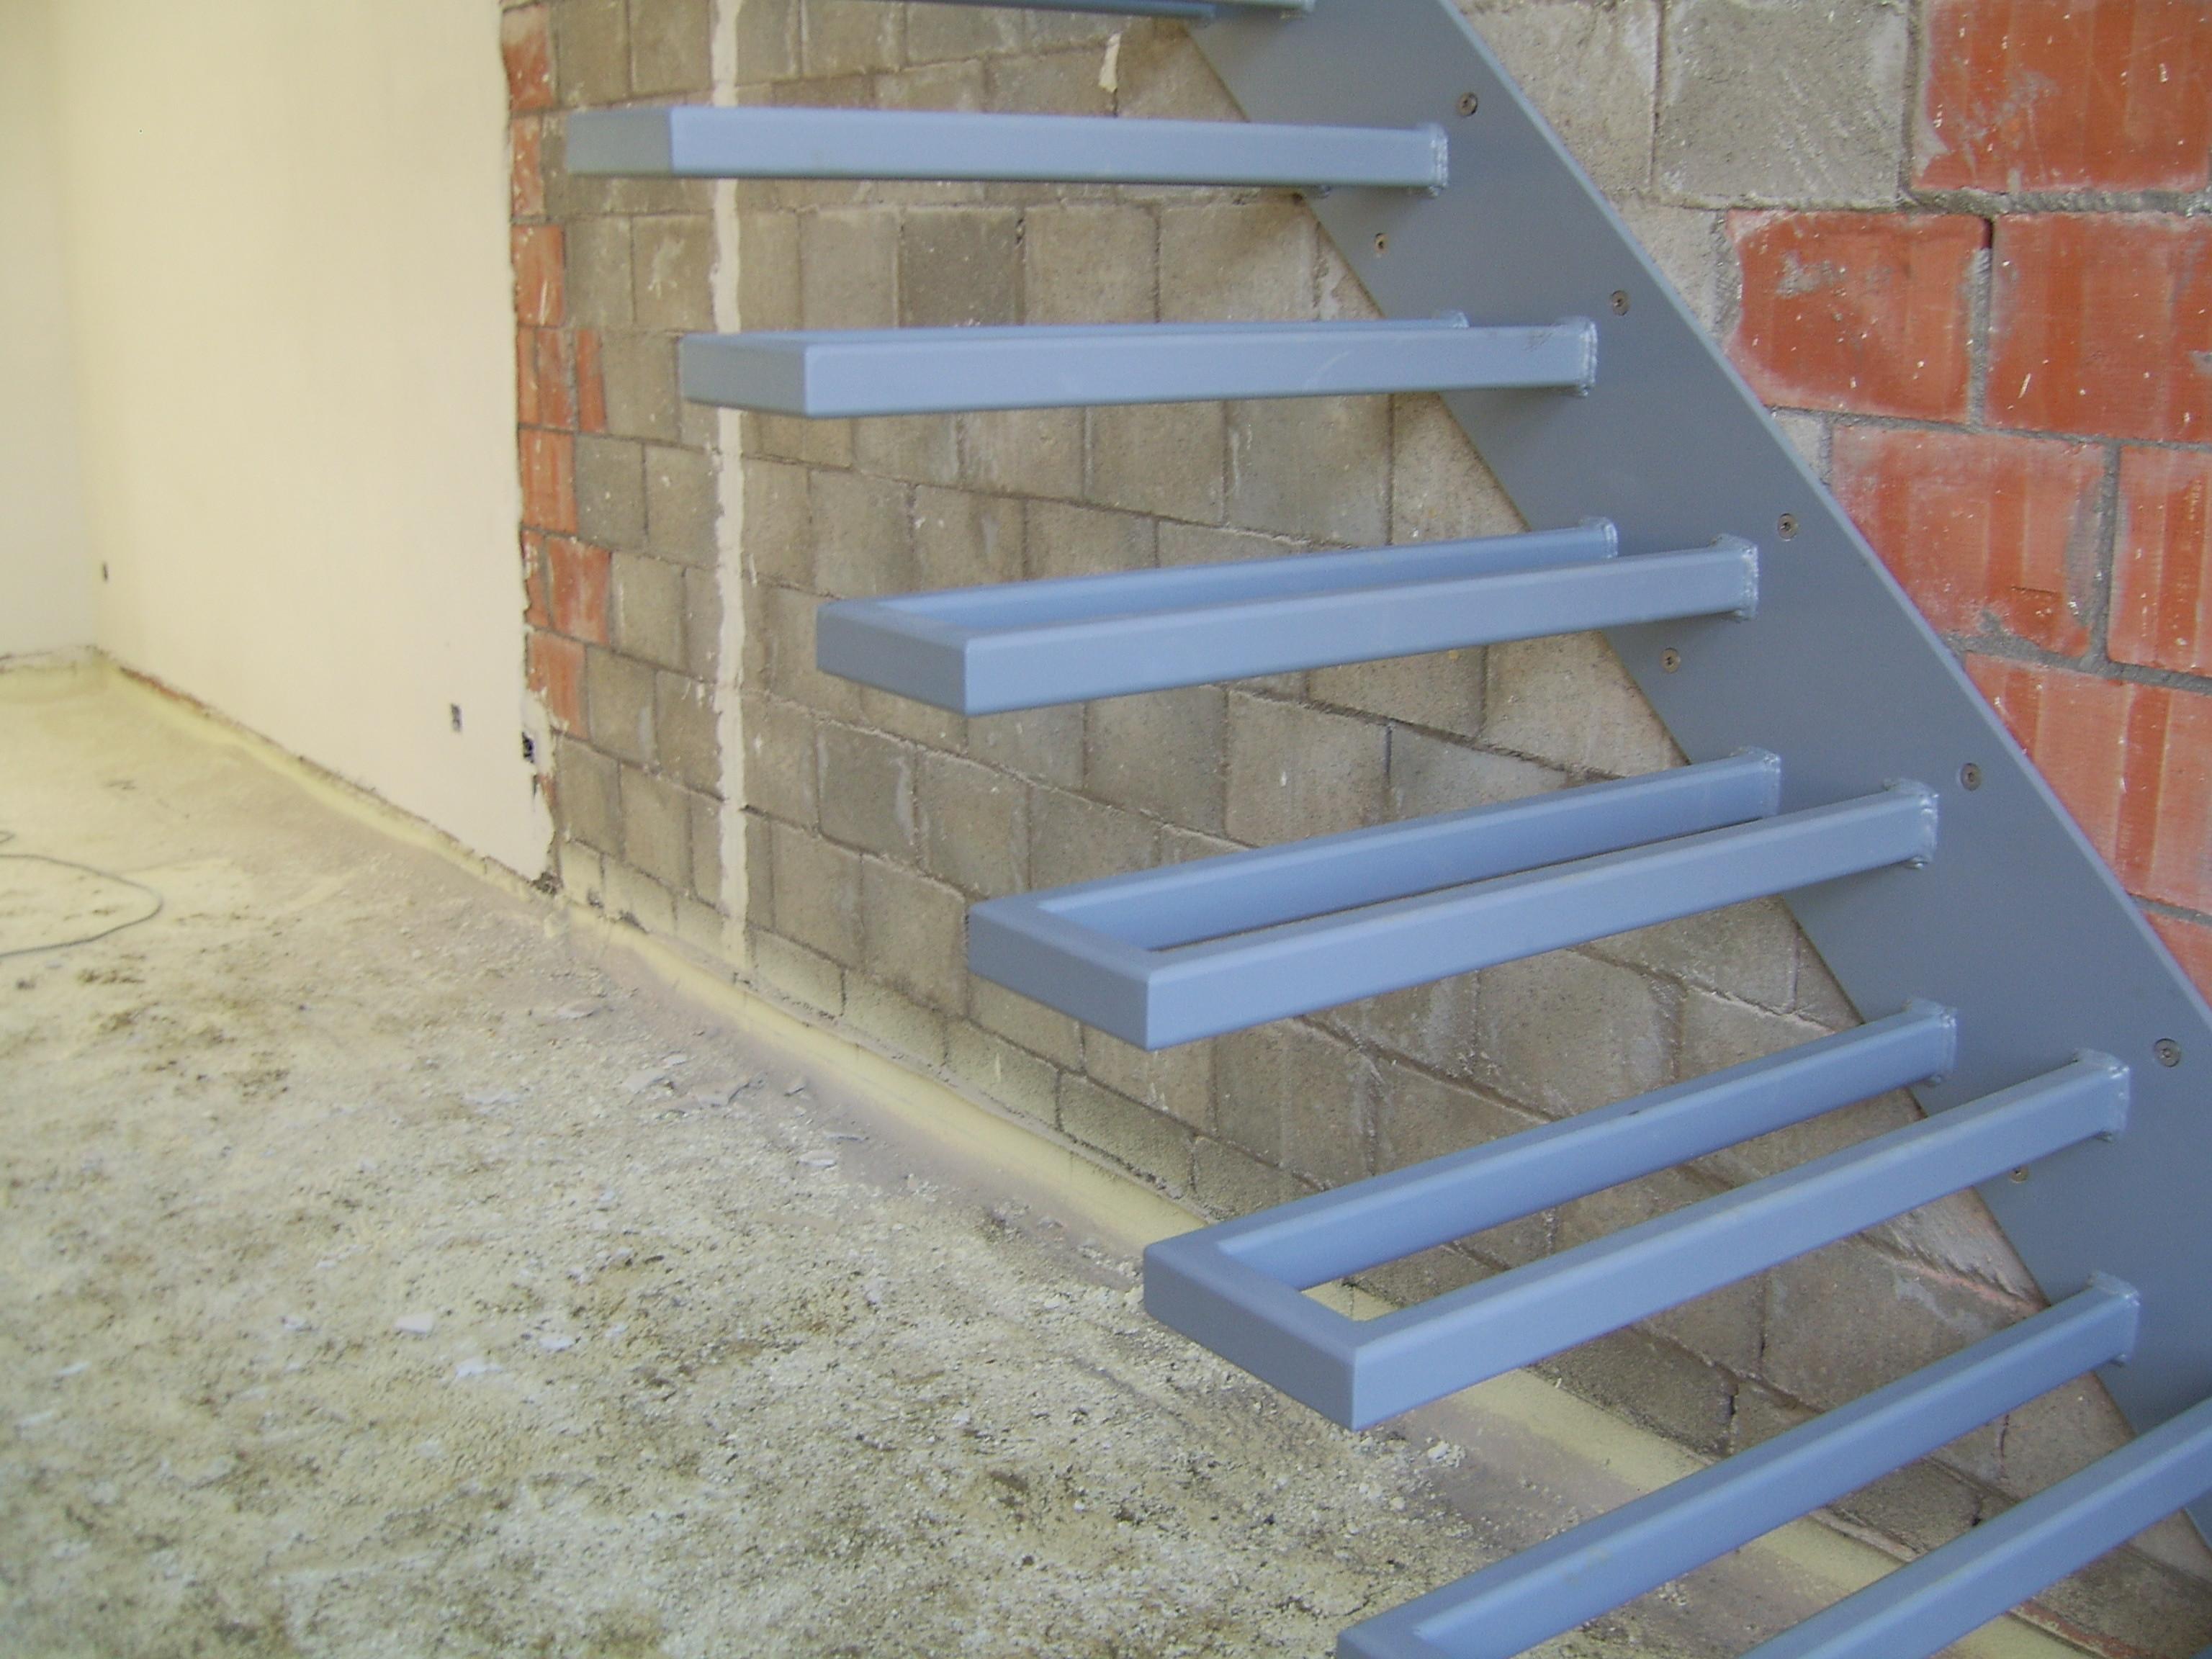 Zwevende Trap Kosten : Zwevende trap in opbouw andere opbouw lg laeremans geert nv